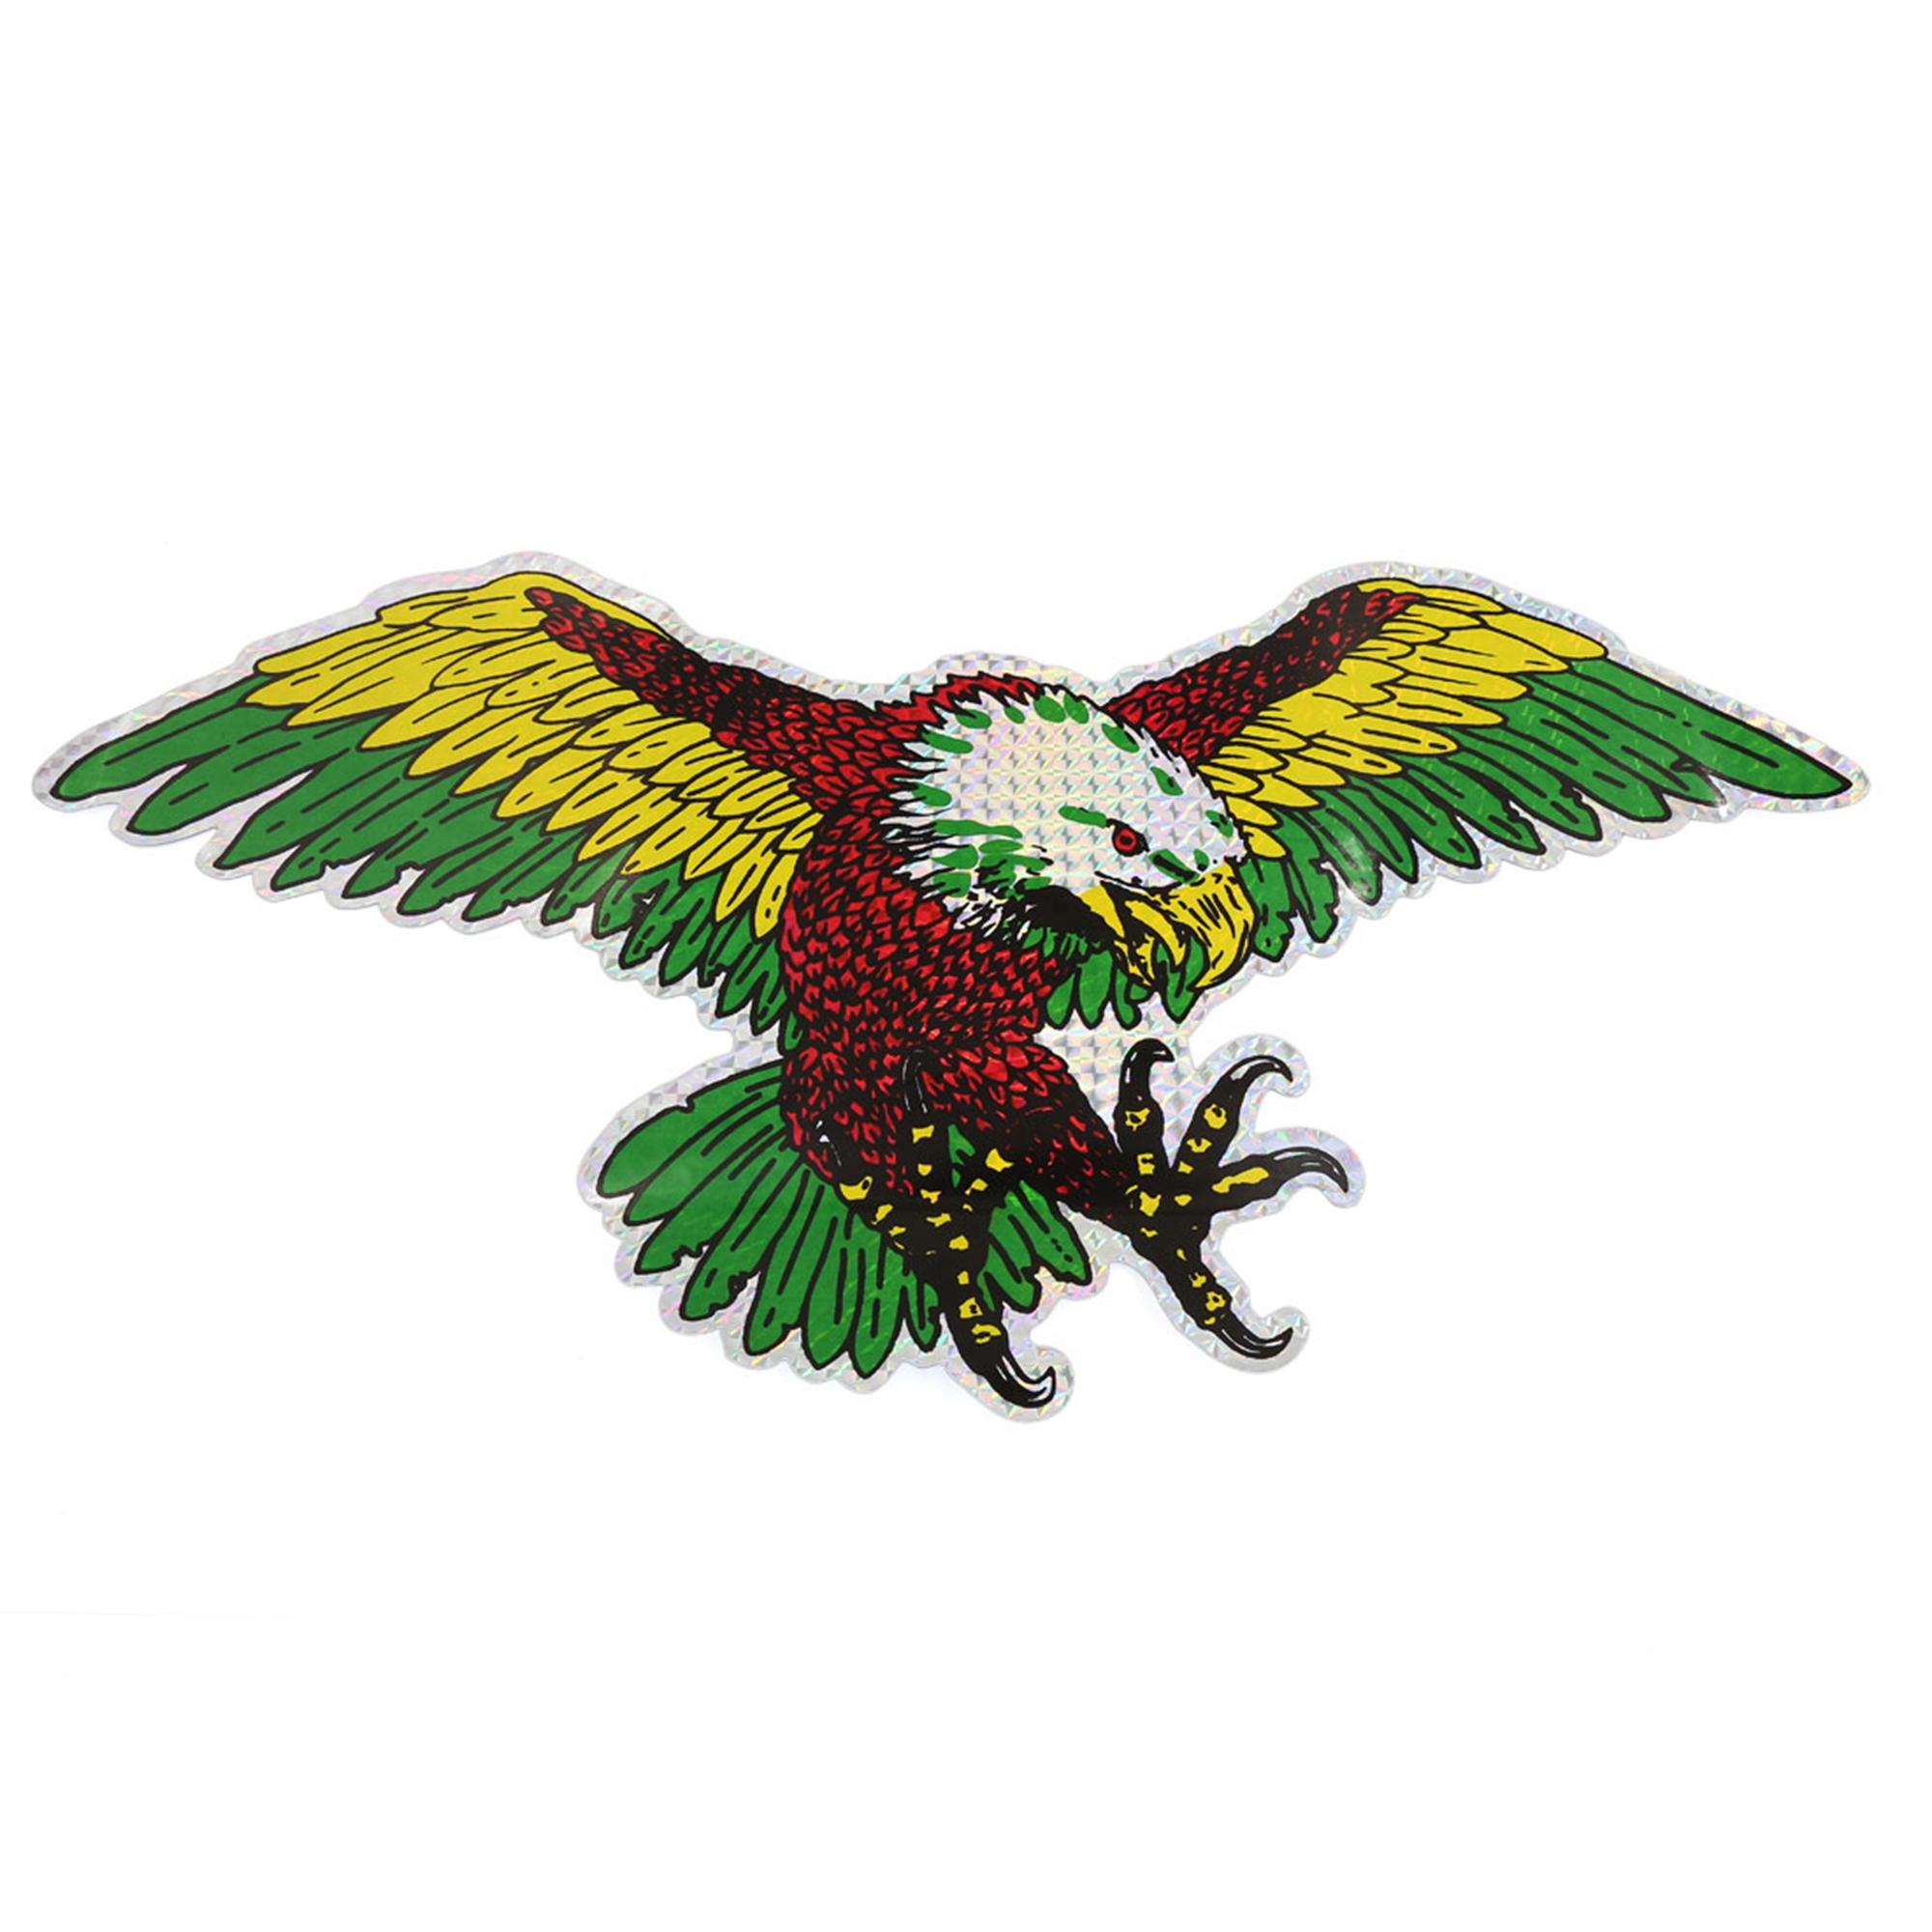 2D Flying Eagle Design Car Window Decal Stick-on Sticker Adorn 44cm x 21.5cm